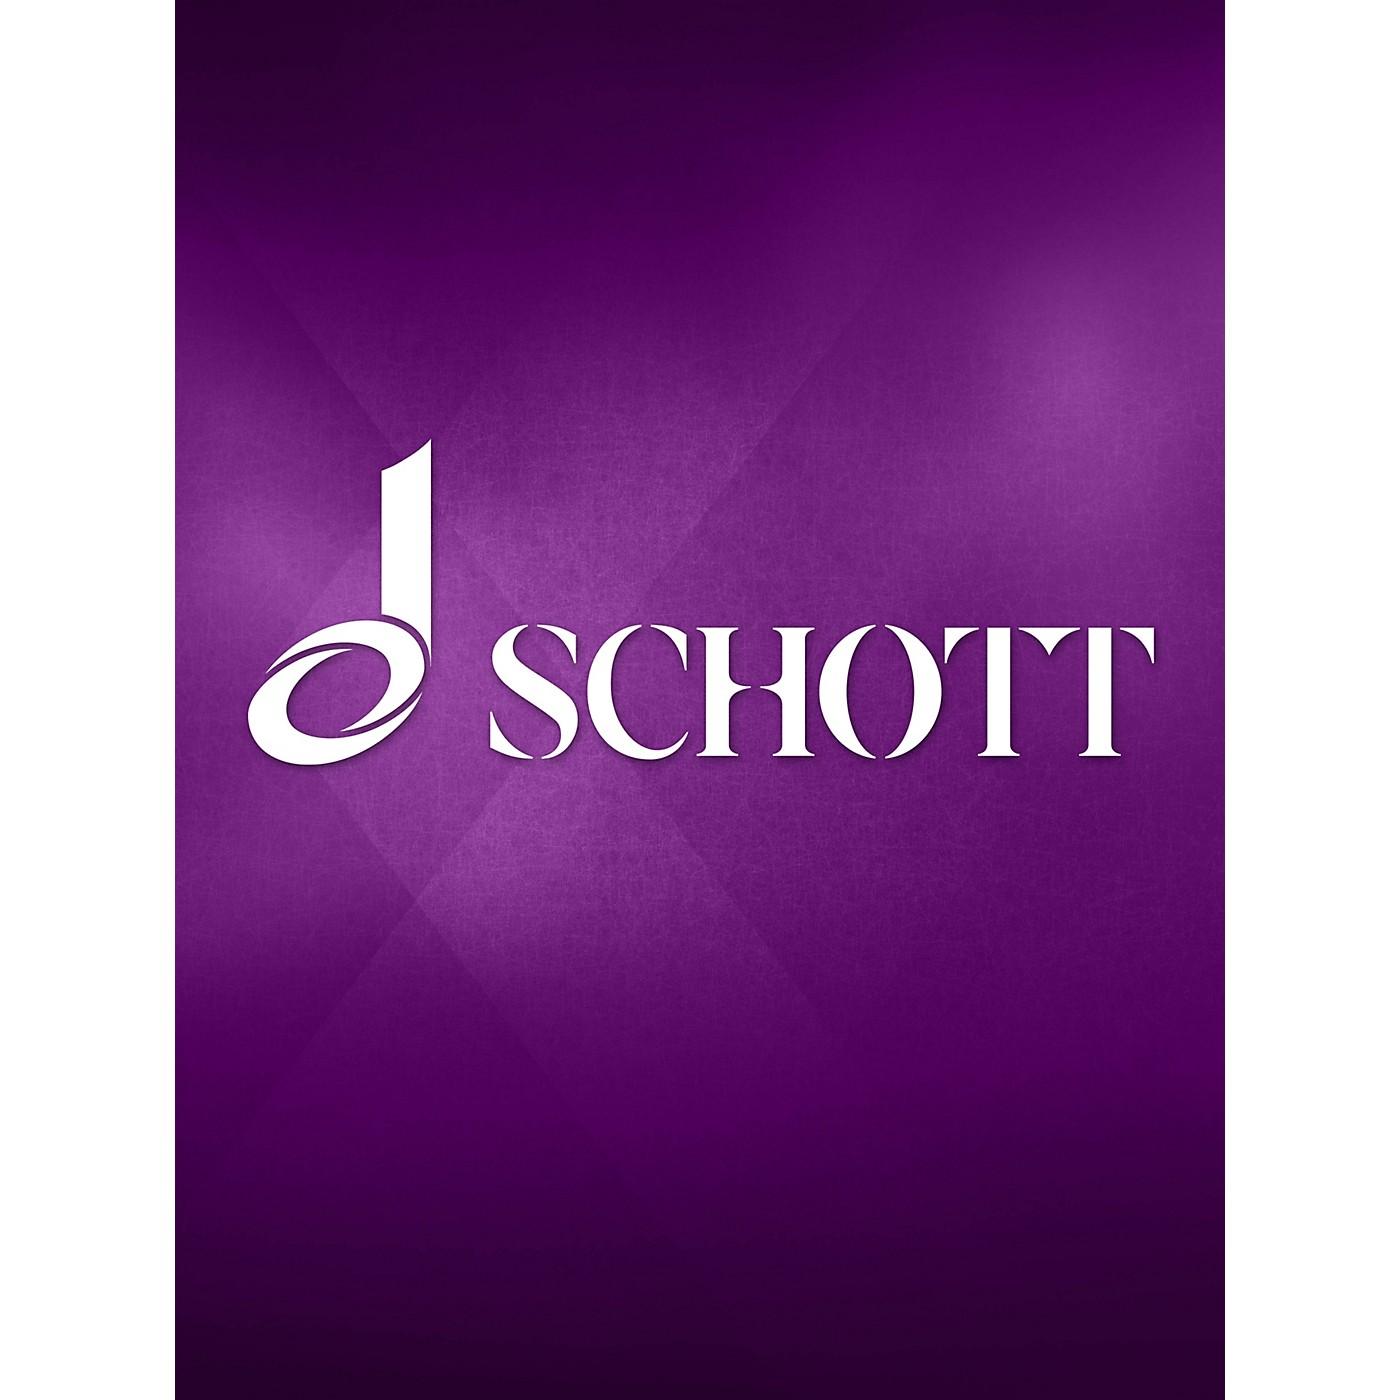 Hal Leonard The Seas Of Kirk Swarf Bass Clarinet & Strings Study Score Study Score Series thumbnail